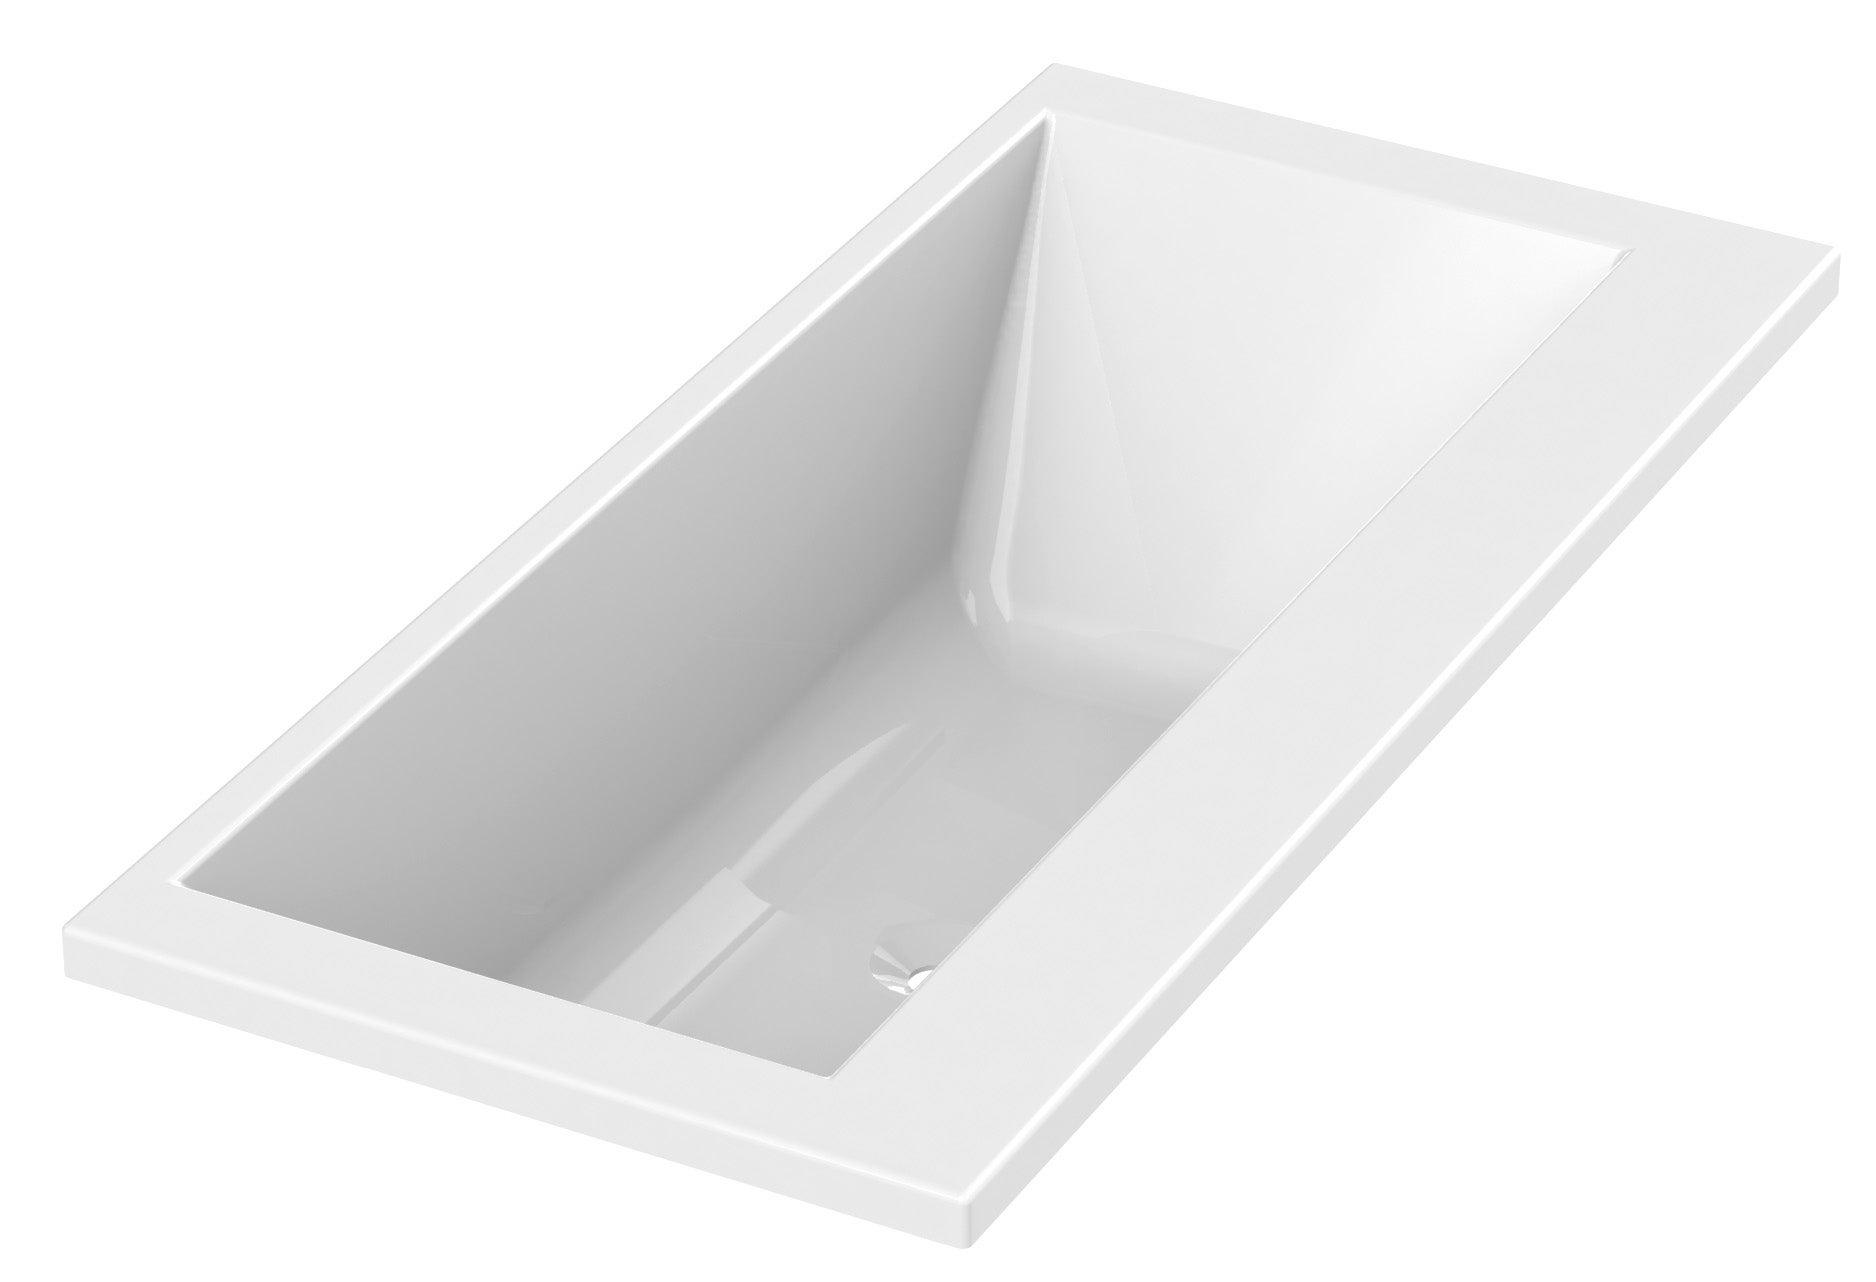 Baignoire Rectangulaire L 180x L 85 Cm Blanc Sensea Premium Design Leroy Merlin